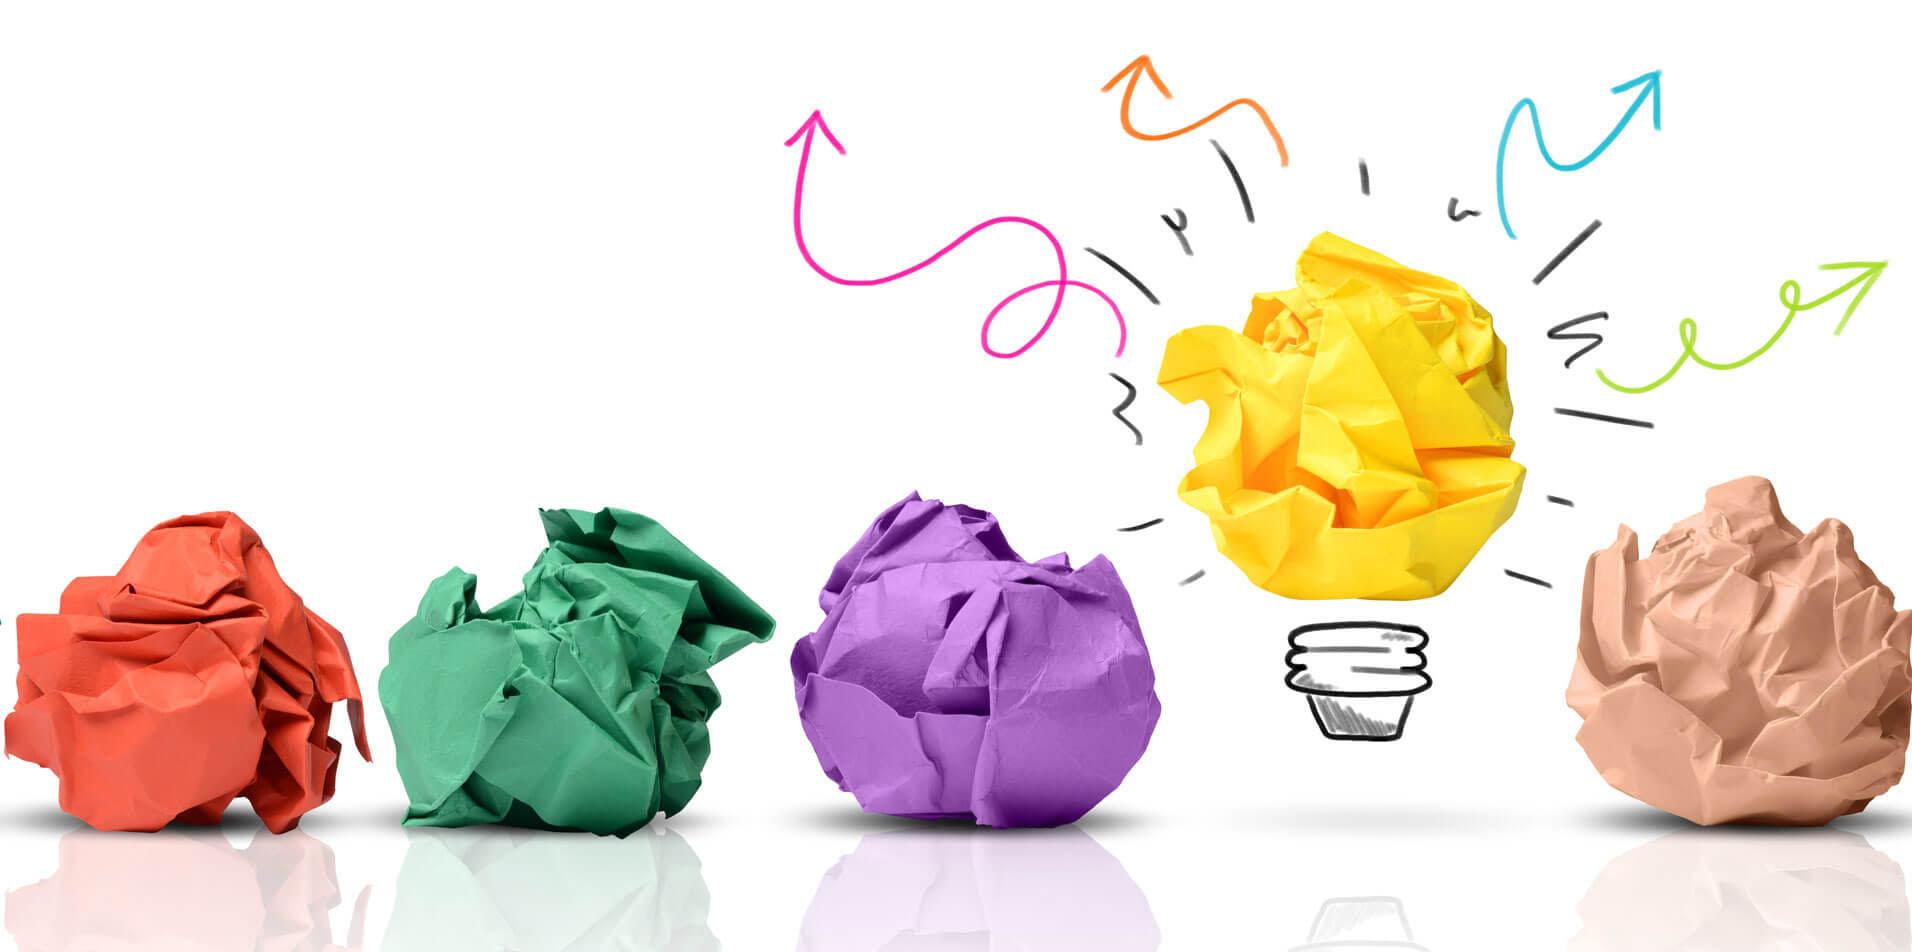 graphic design - creative designs